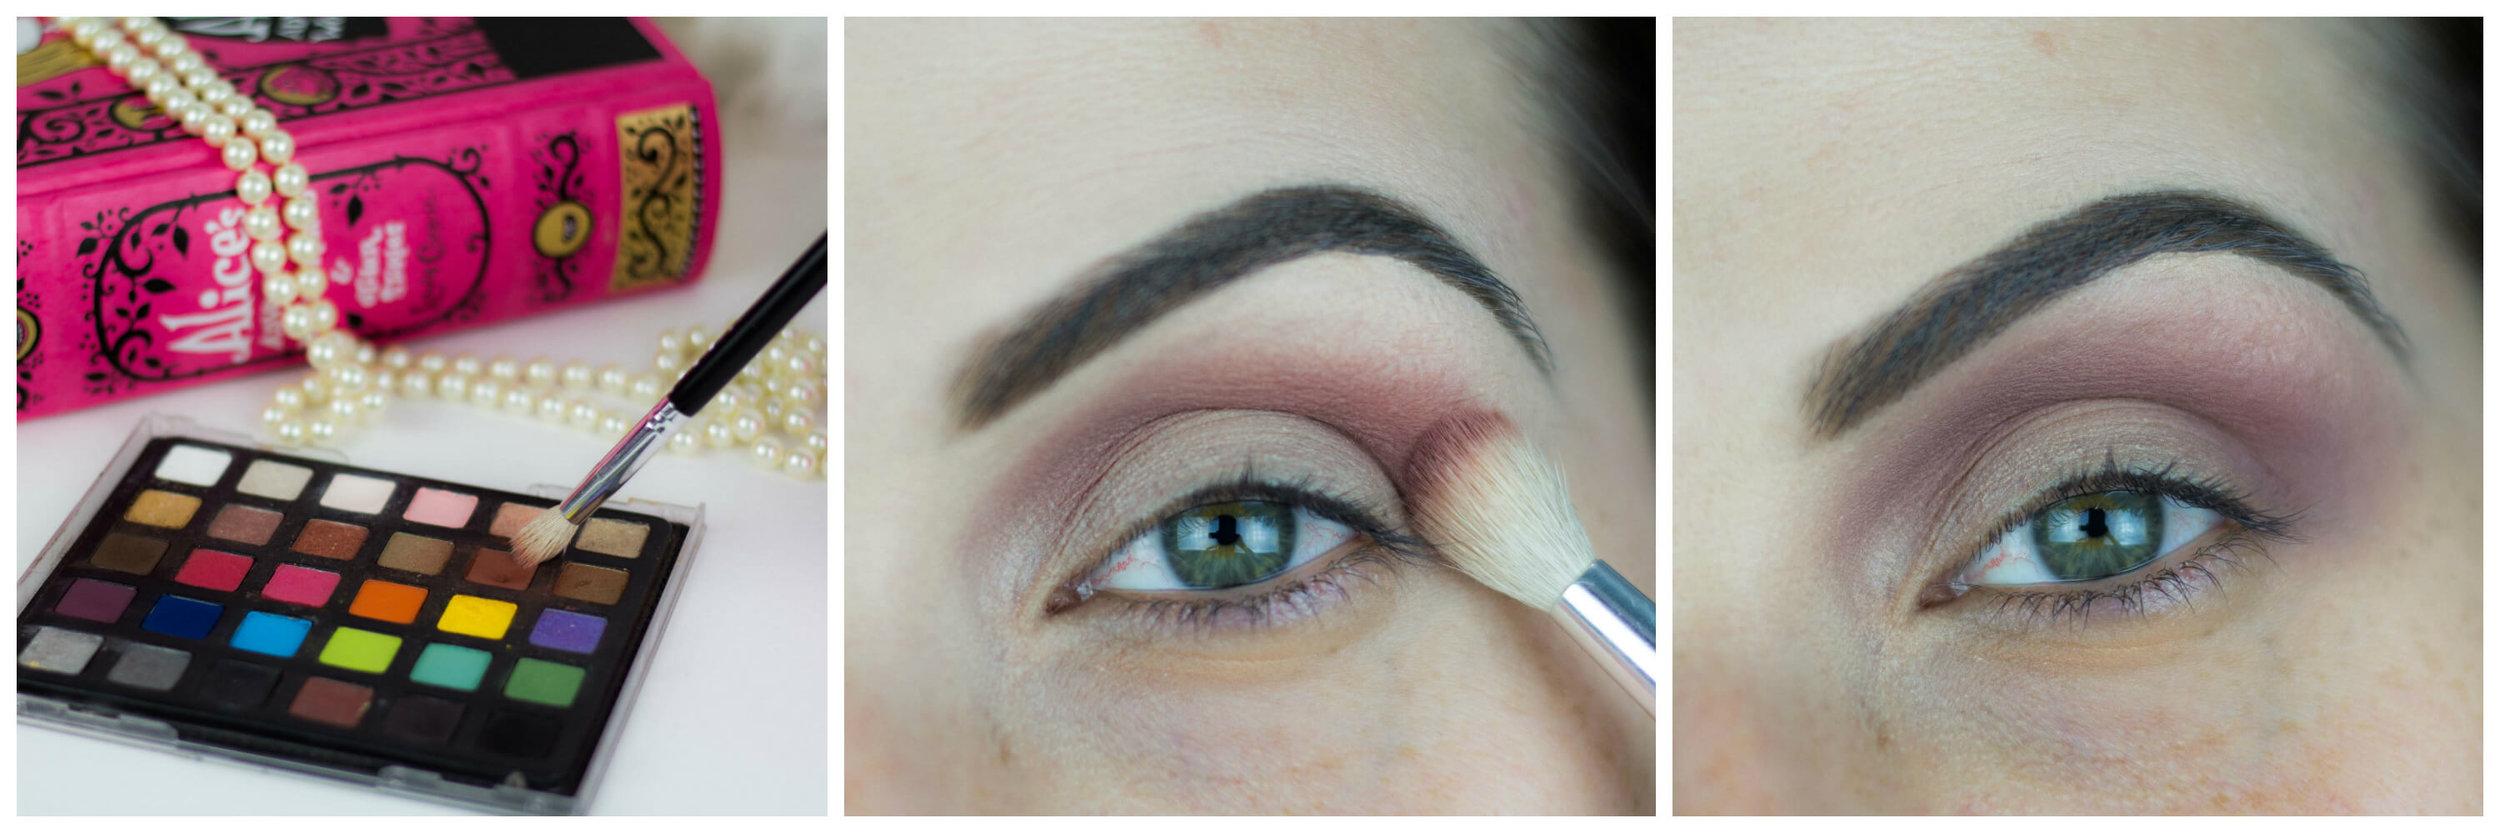 Maquiagem com glitter multicolorido